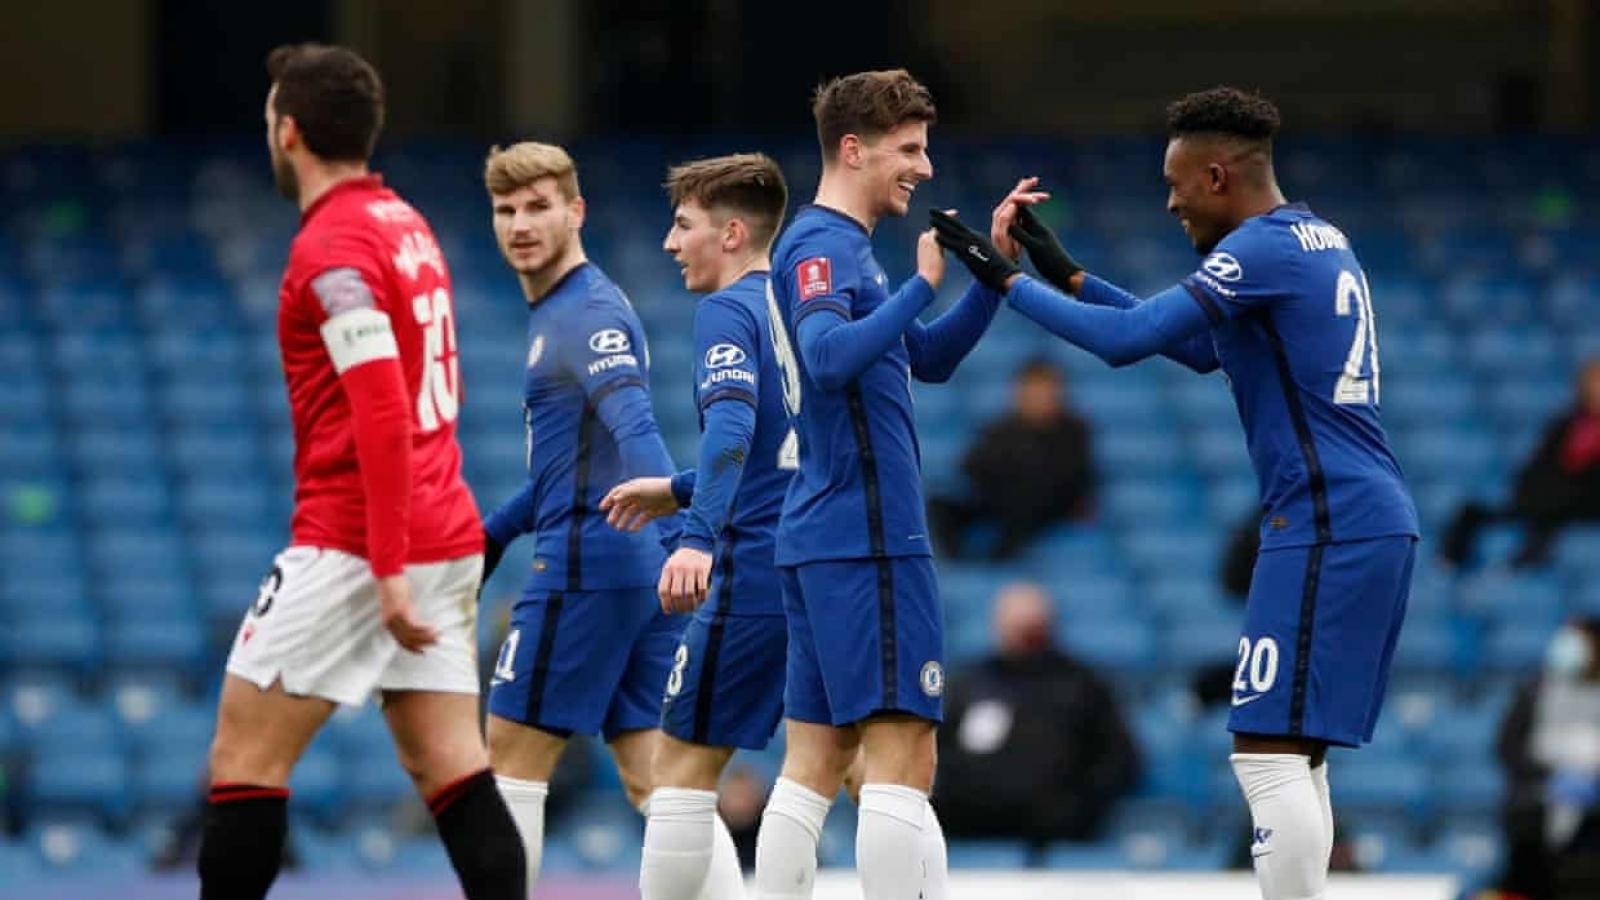 Vòng 3 FA Cup: Chelsea, Man City thắng trận tưng bừng